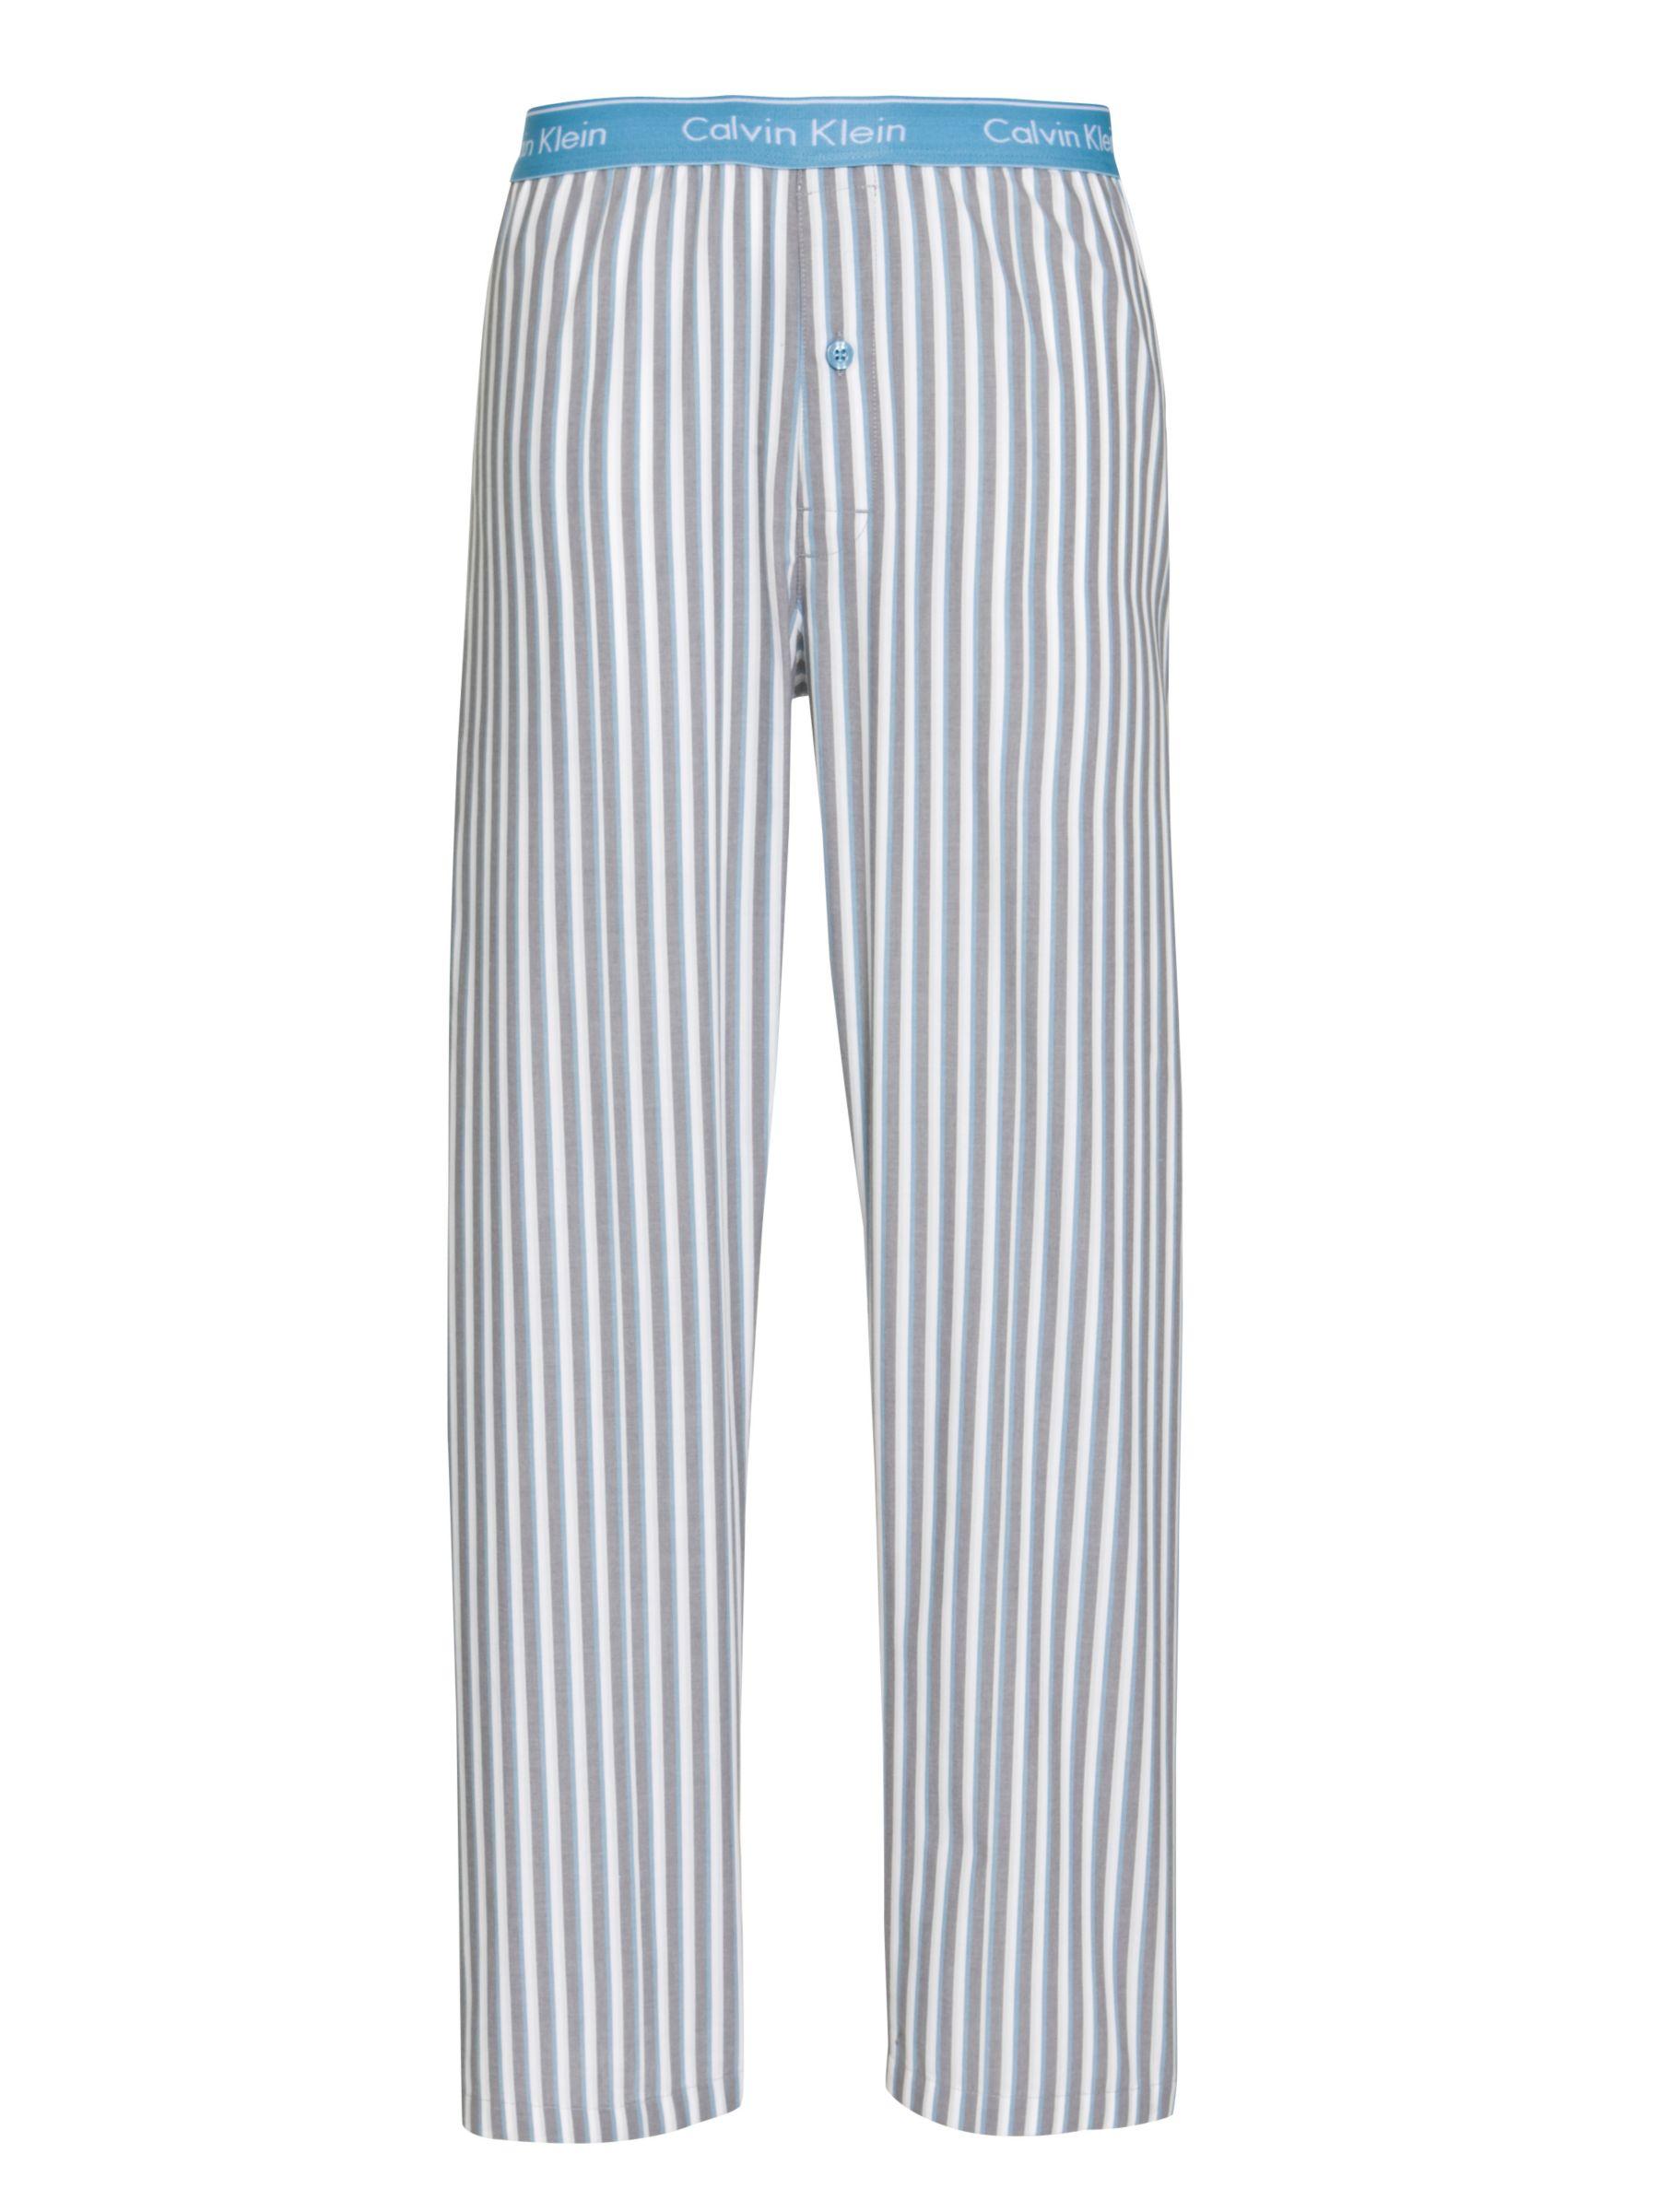 Calvin Klein Woven Striped Pyjama Trousers, Grey